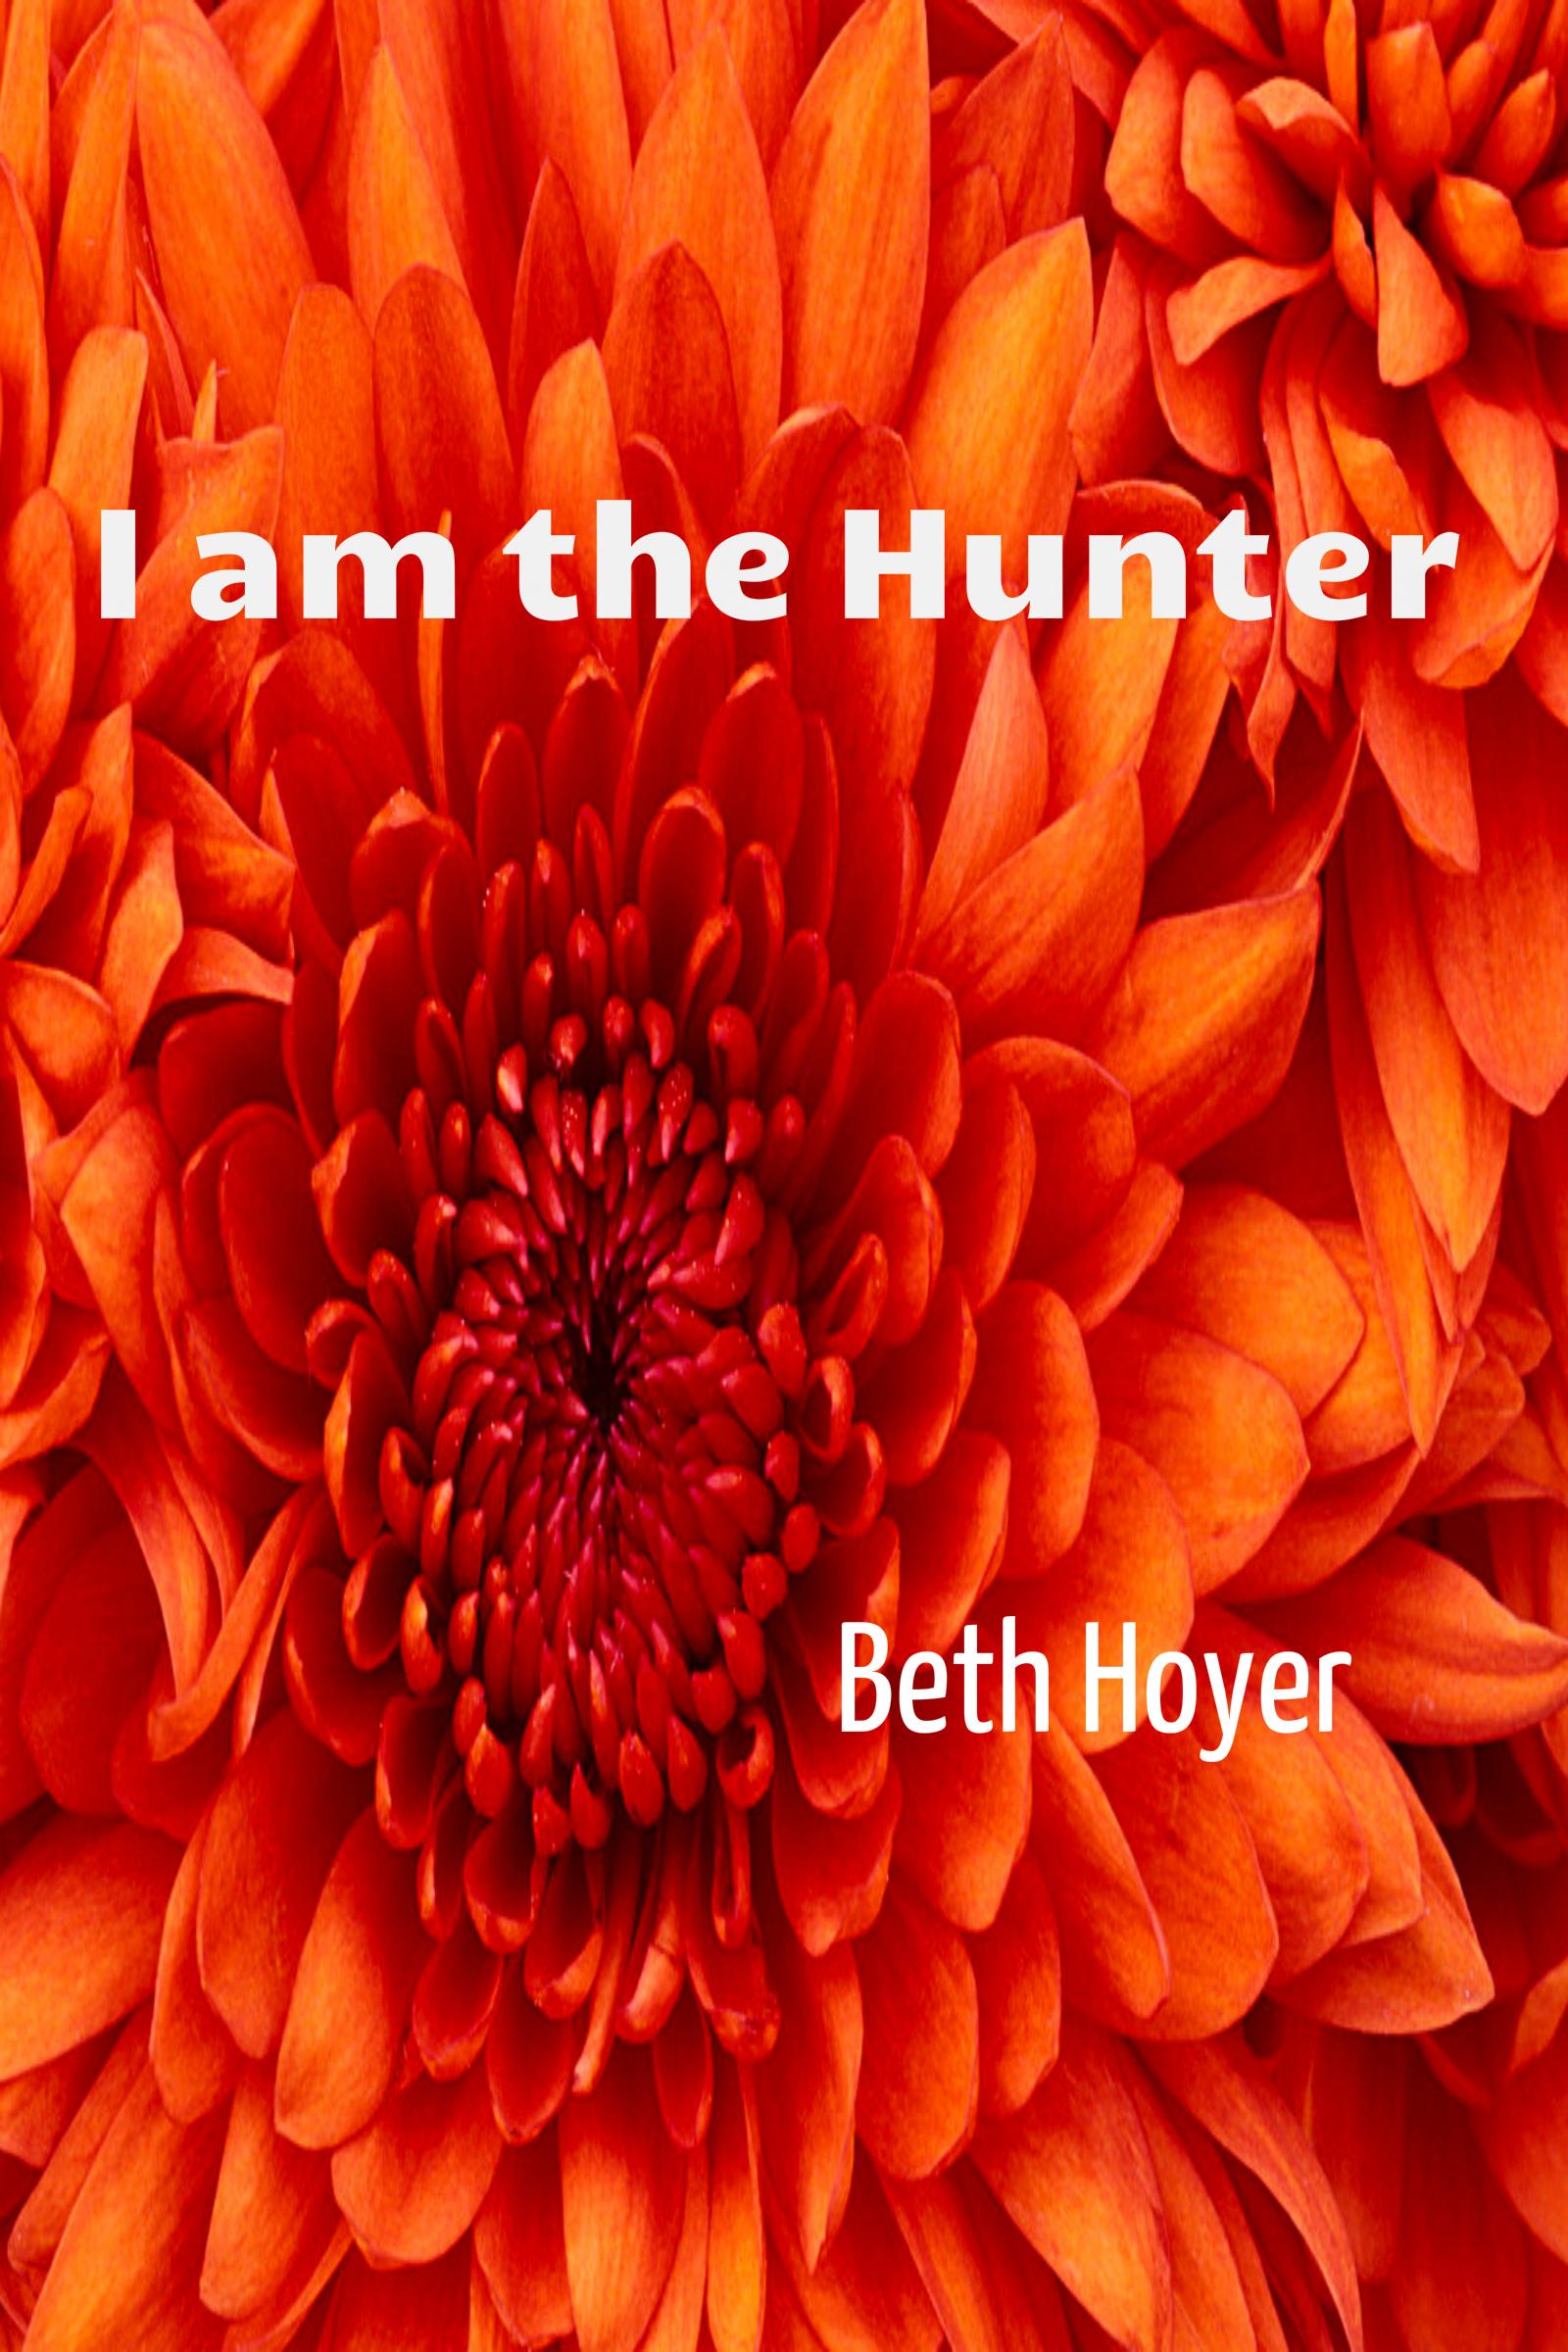 I am the Hunter Beth Hoyer